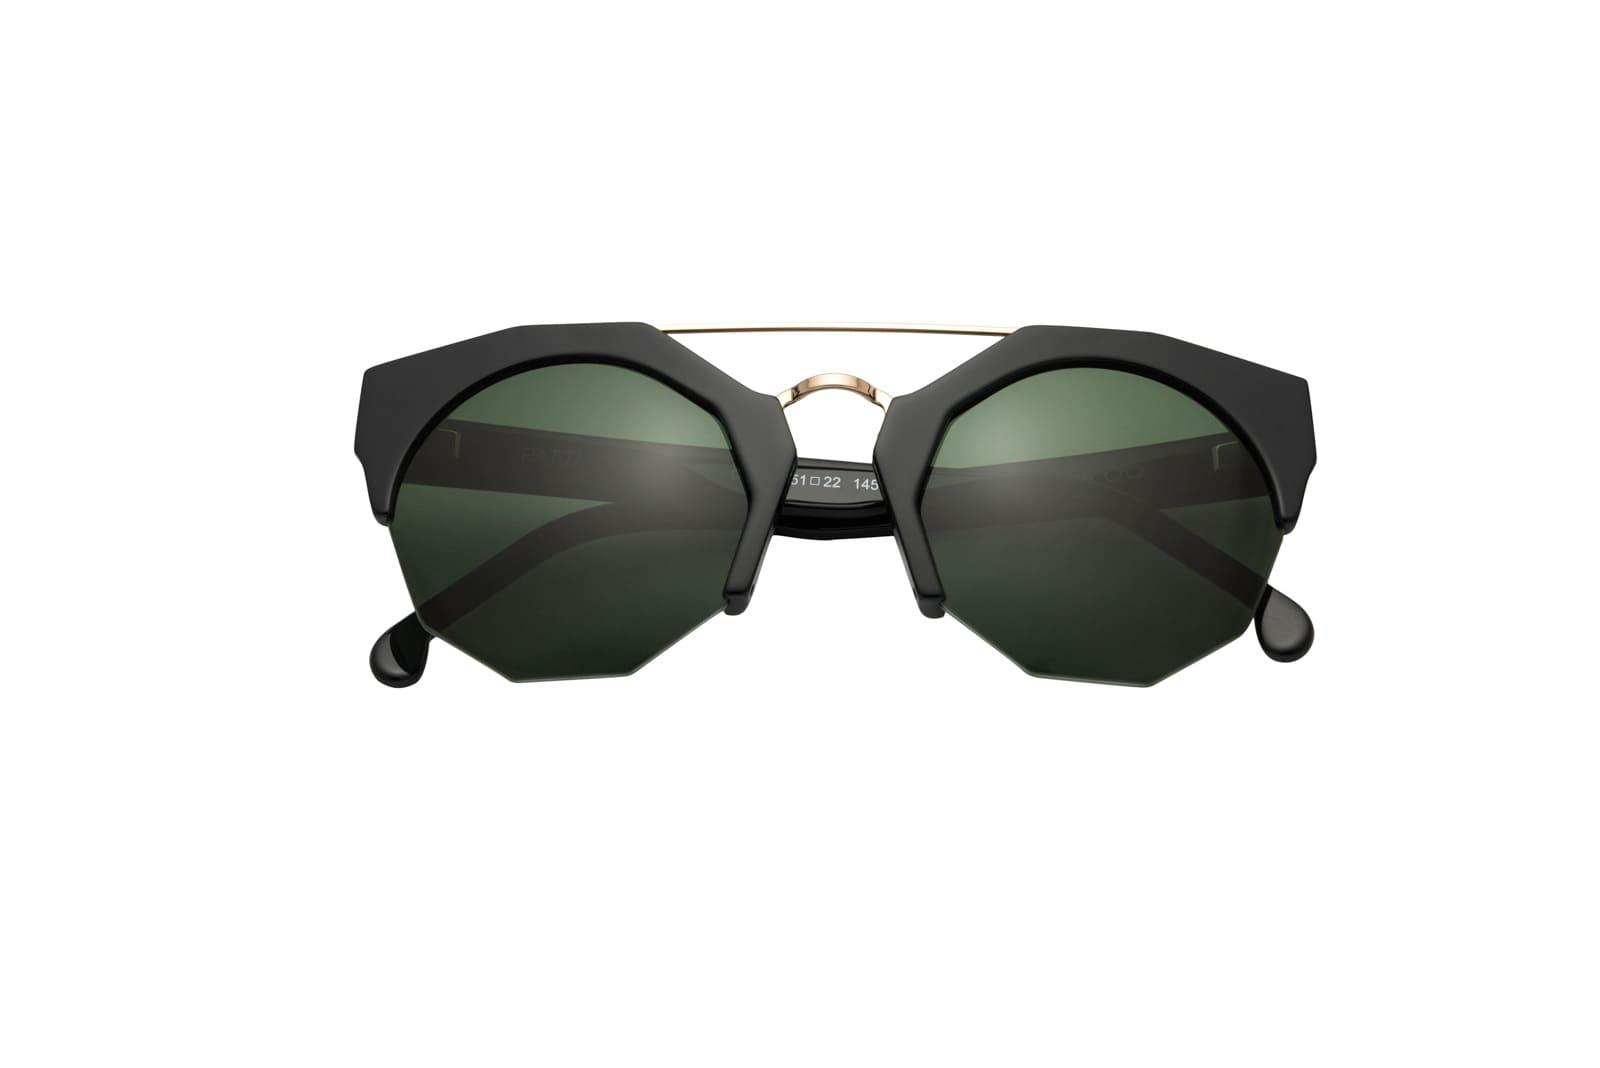 8741729b4f Italian sunglasses Kyme -Óptica Gran Vía Barcelona